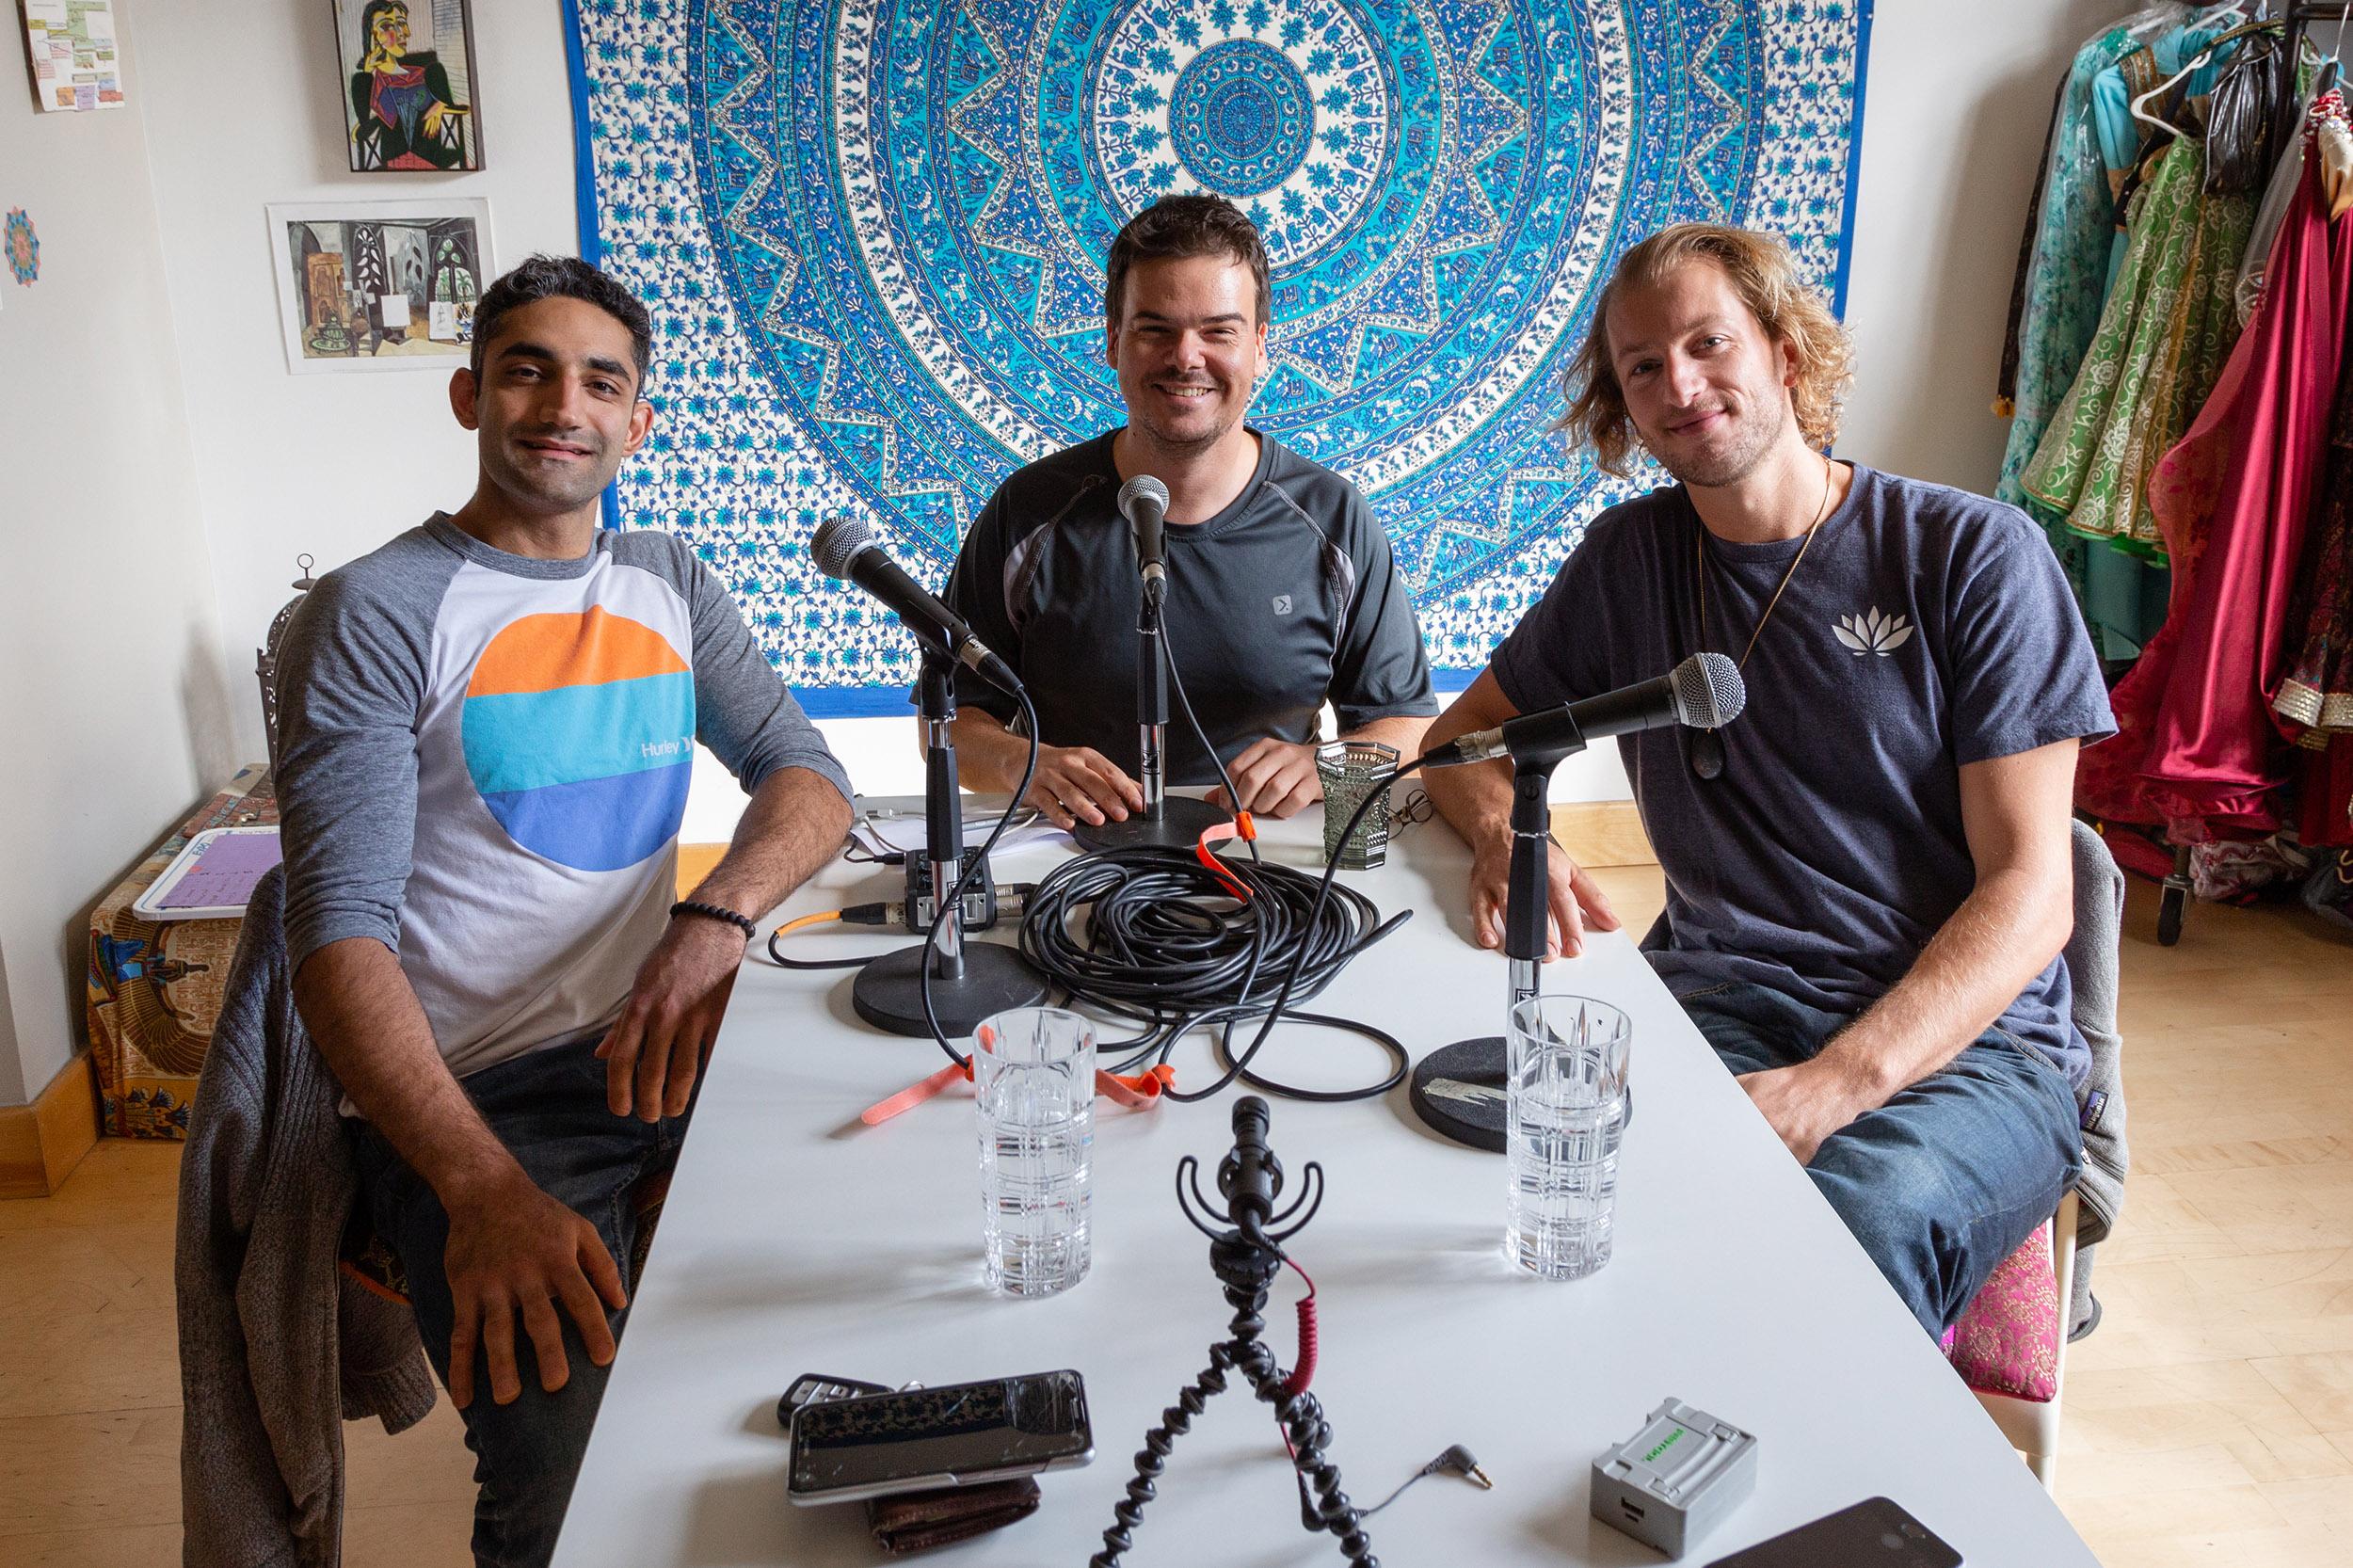 Pedro Bonatto talking to Anand Ondhia and Jesse Ratner-Decle at his home studio.